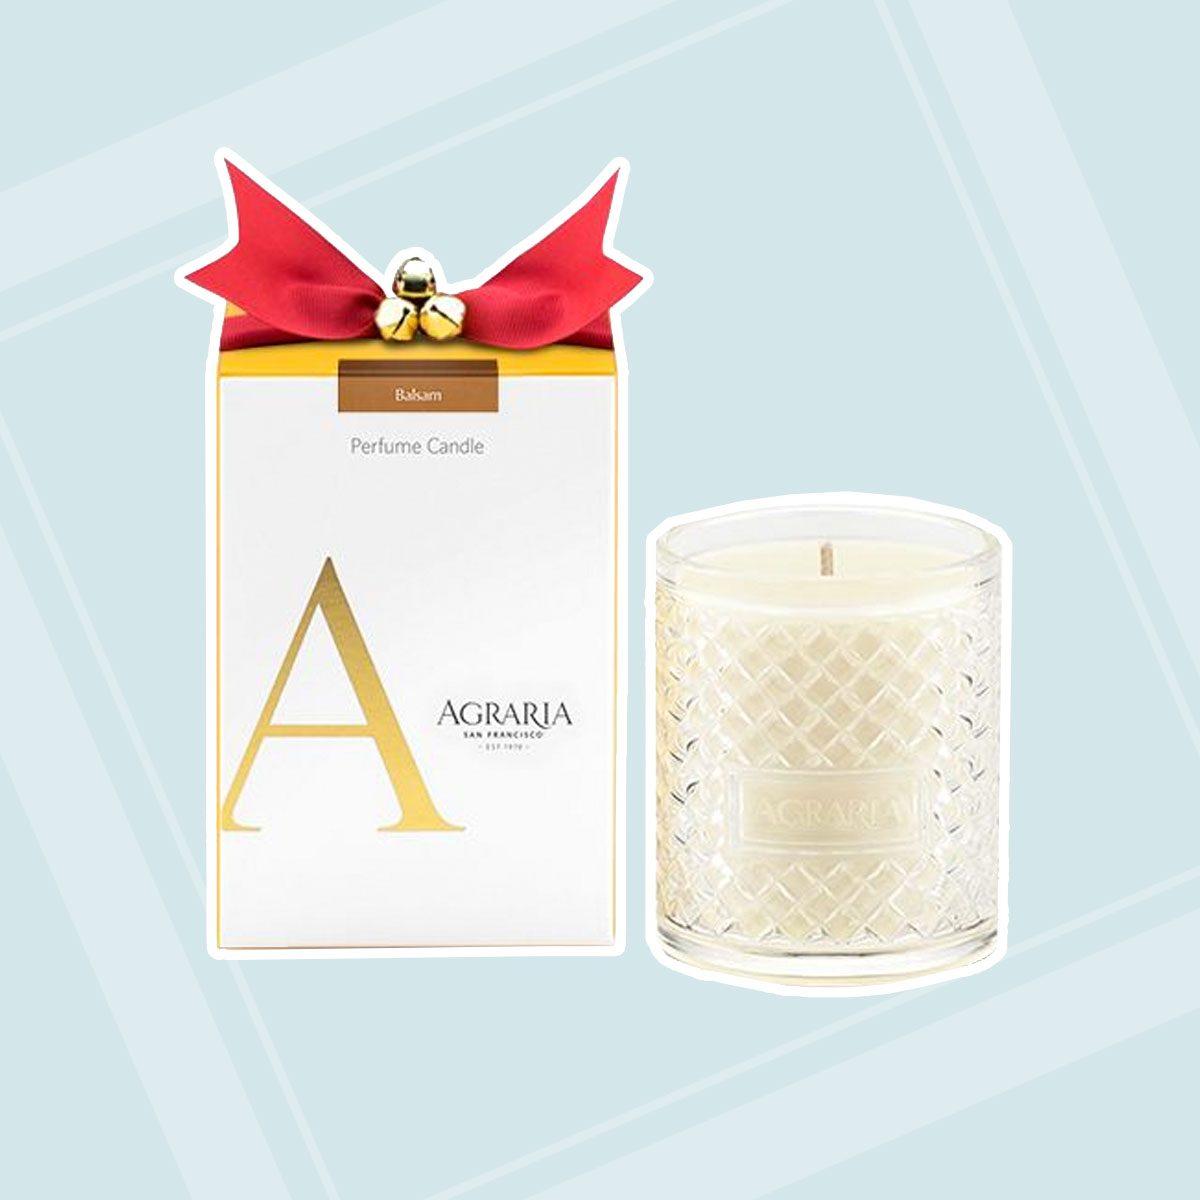 Balsam Perfume Candle